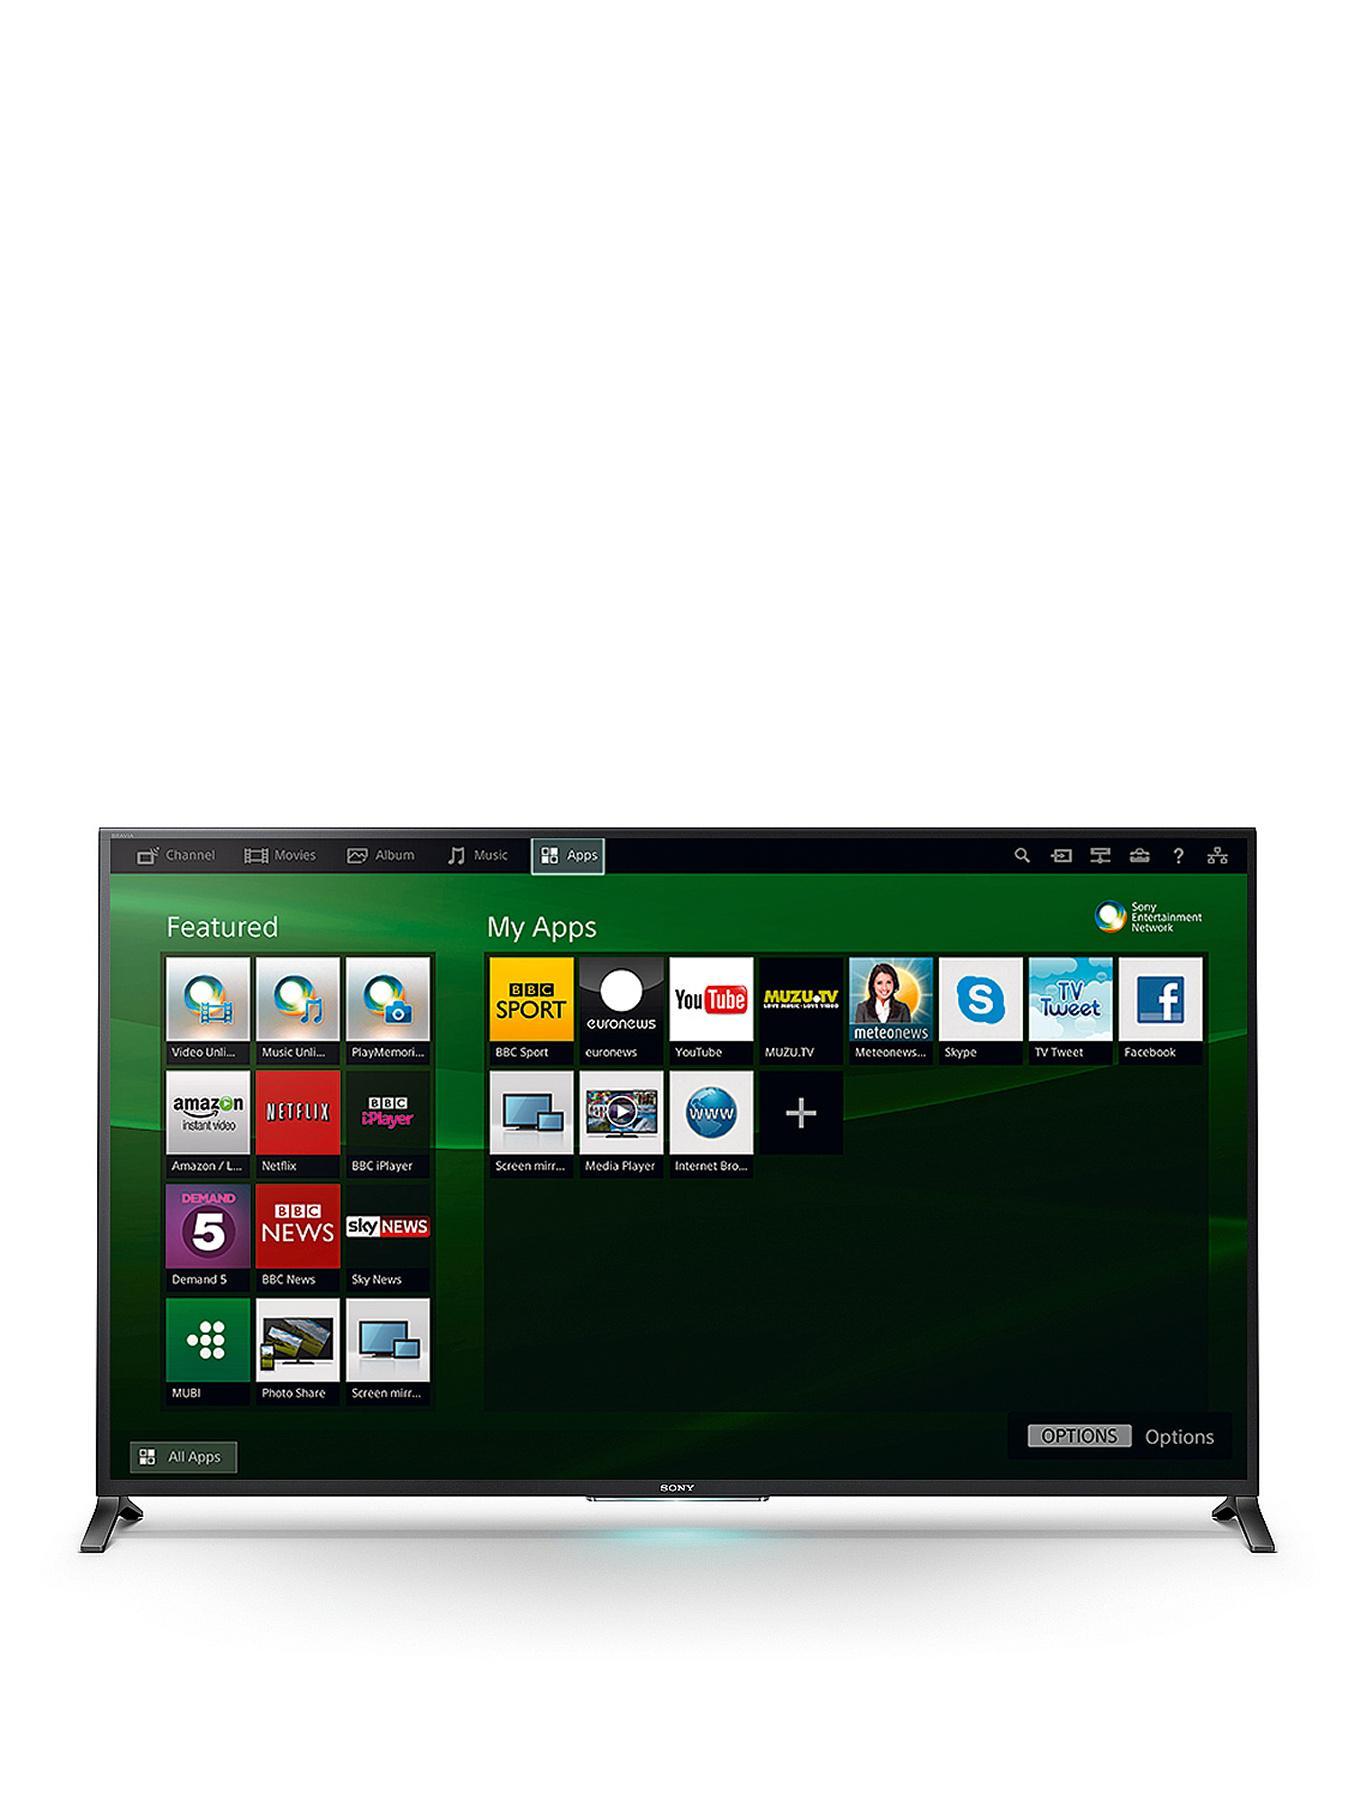 Sony KDL60W855BBU 60-inch Wedge Design Widescreen 1080p Full HD Smart LED 3D TV